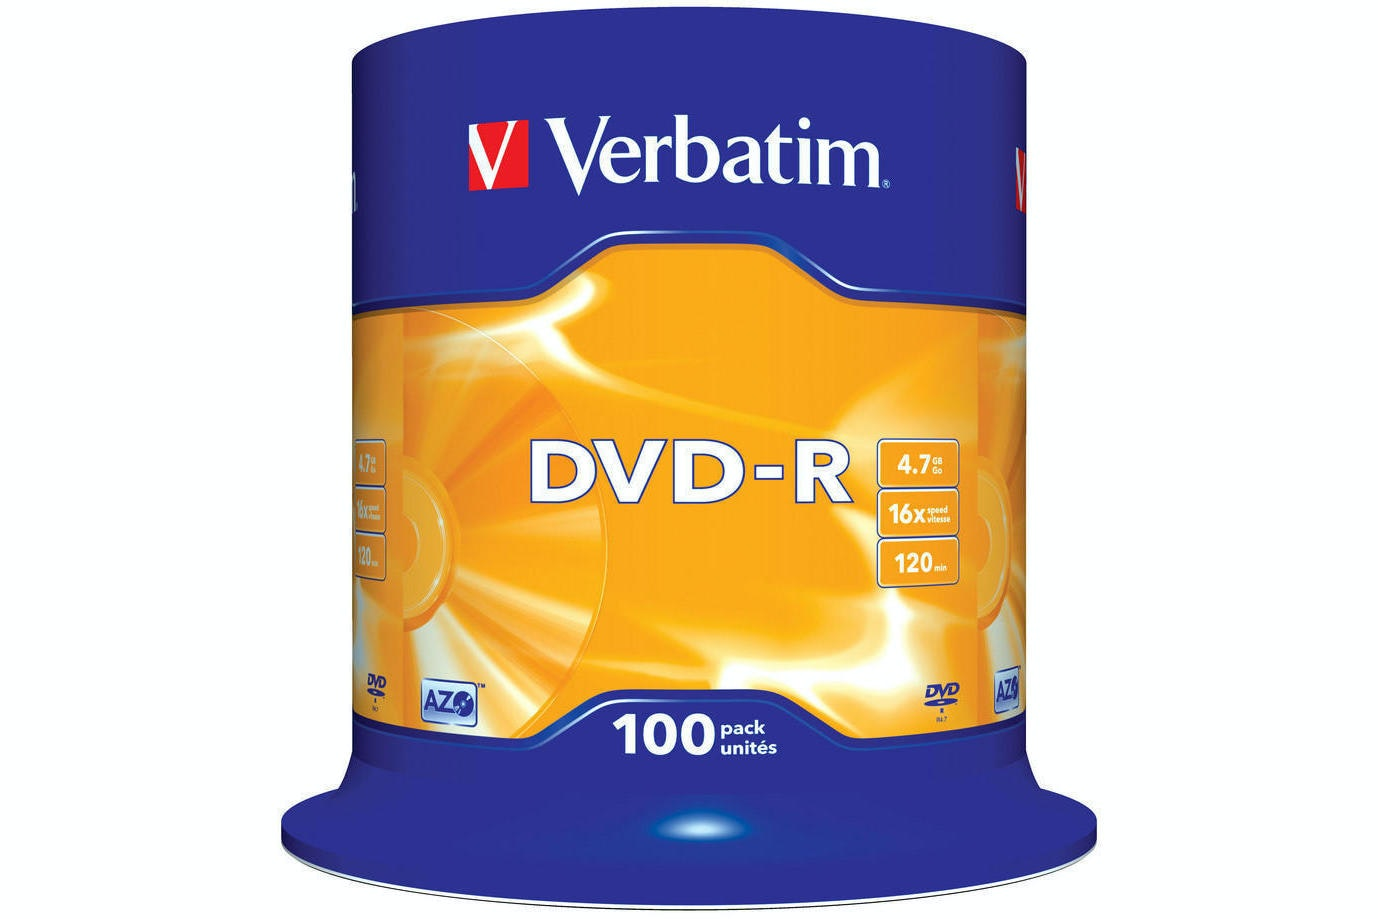 Verbatim DVD-R 100 Pack | 43549